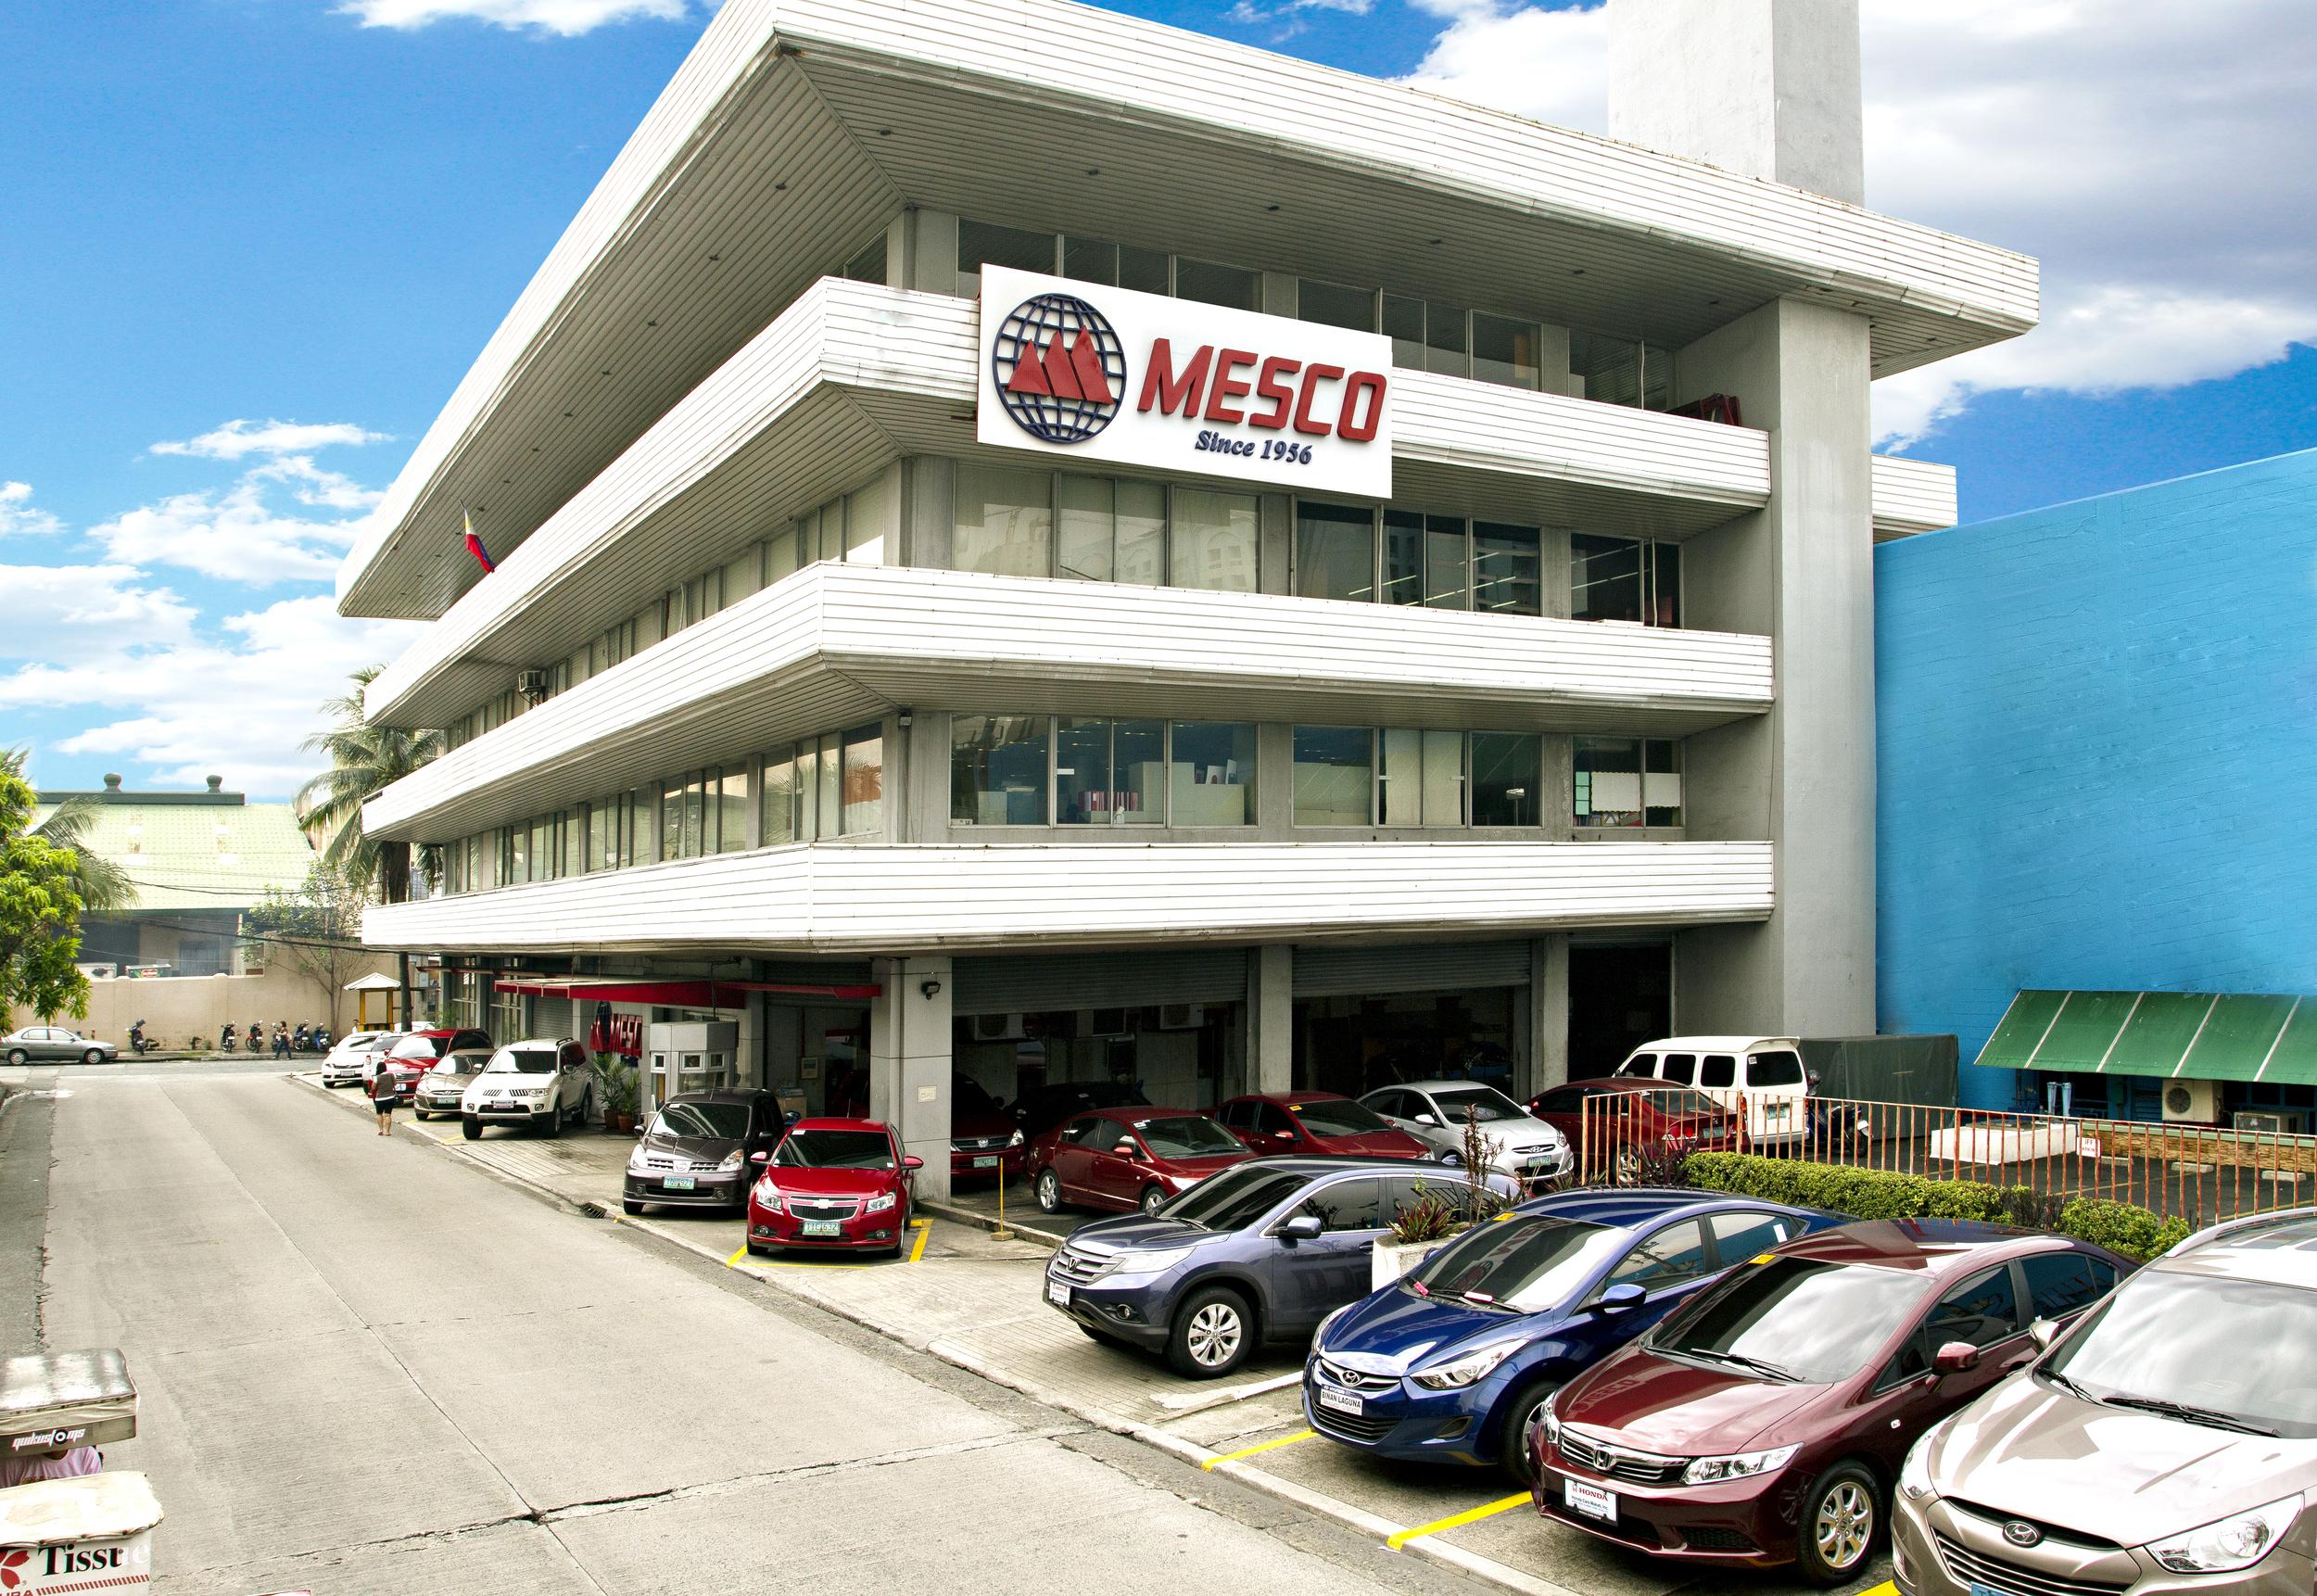 MESCO HEADQUARTERS in PASIG CITY, mETRO manila